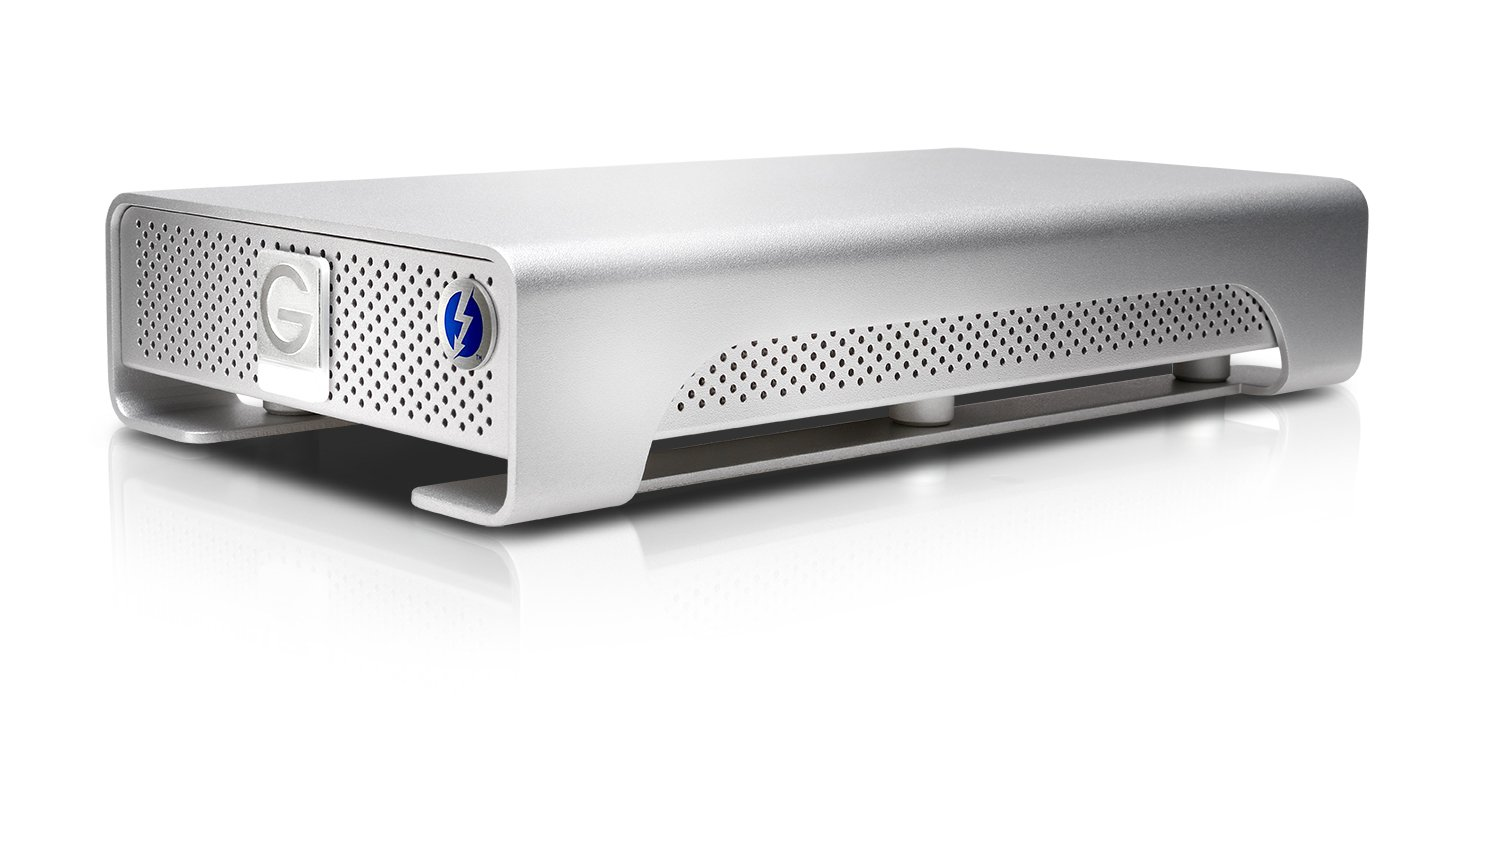 Hitachi G-Drive Thunderbolt 0G03050 4TB USB 3.0 External Hard Drive (Silver) by G-Technology